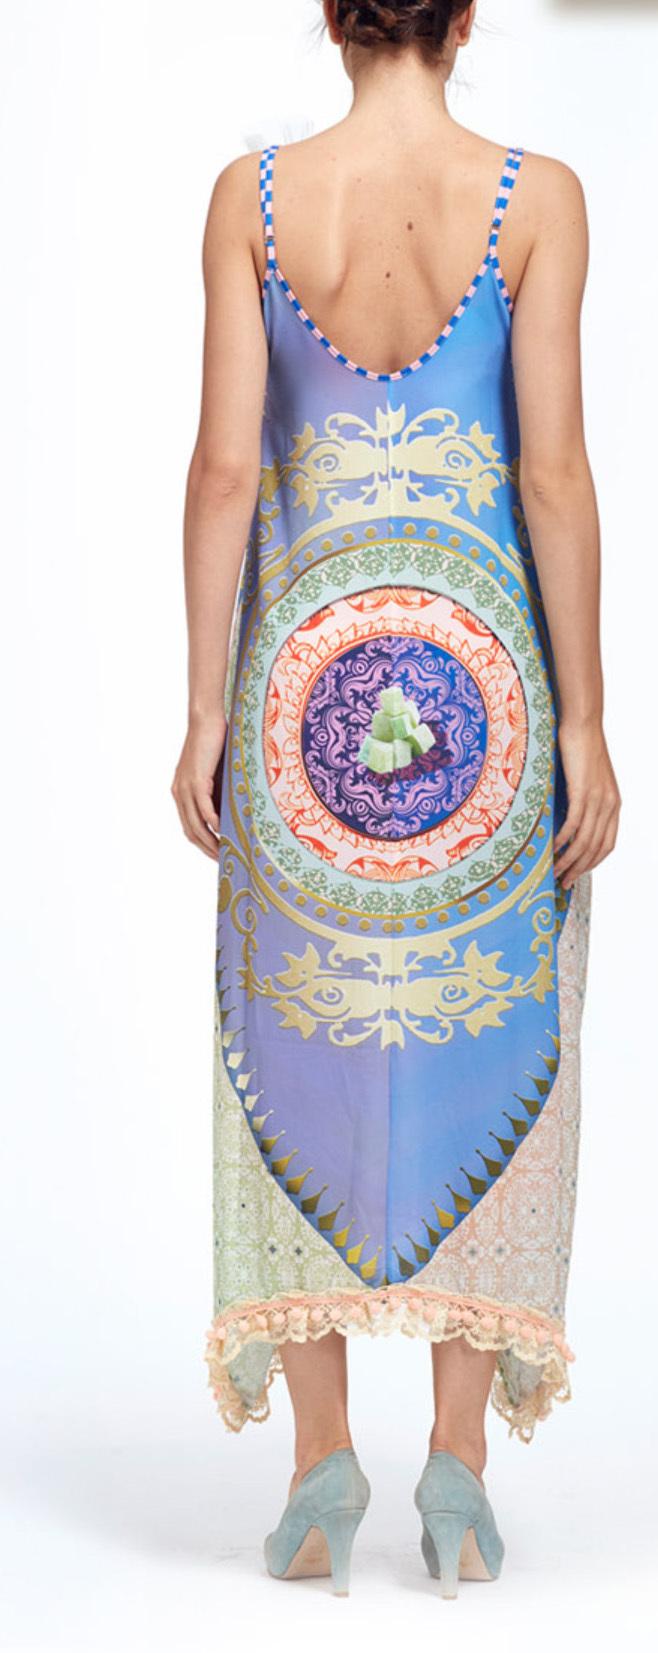 IPNG: Pink Lotus Lokoometric Bow Four Corners Illusion Dress